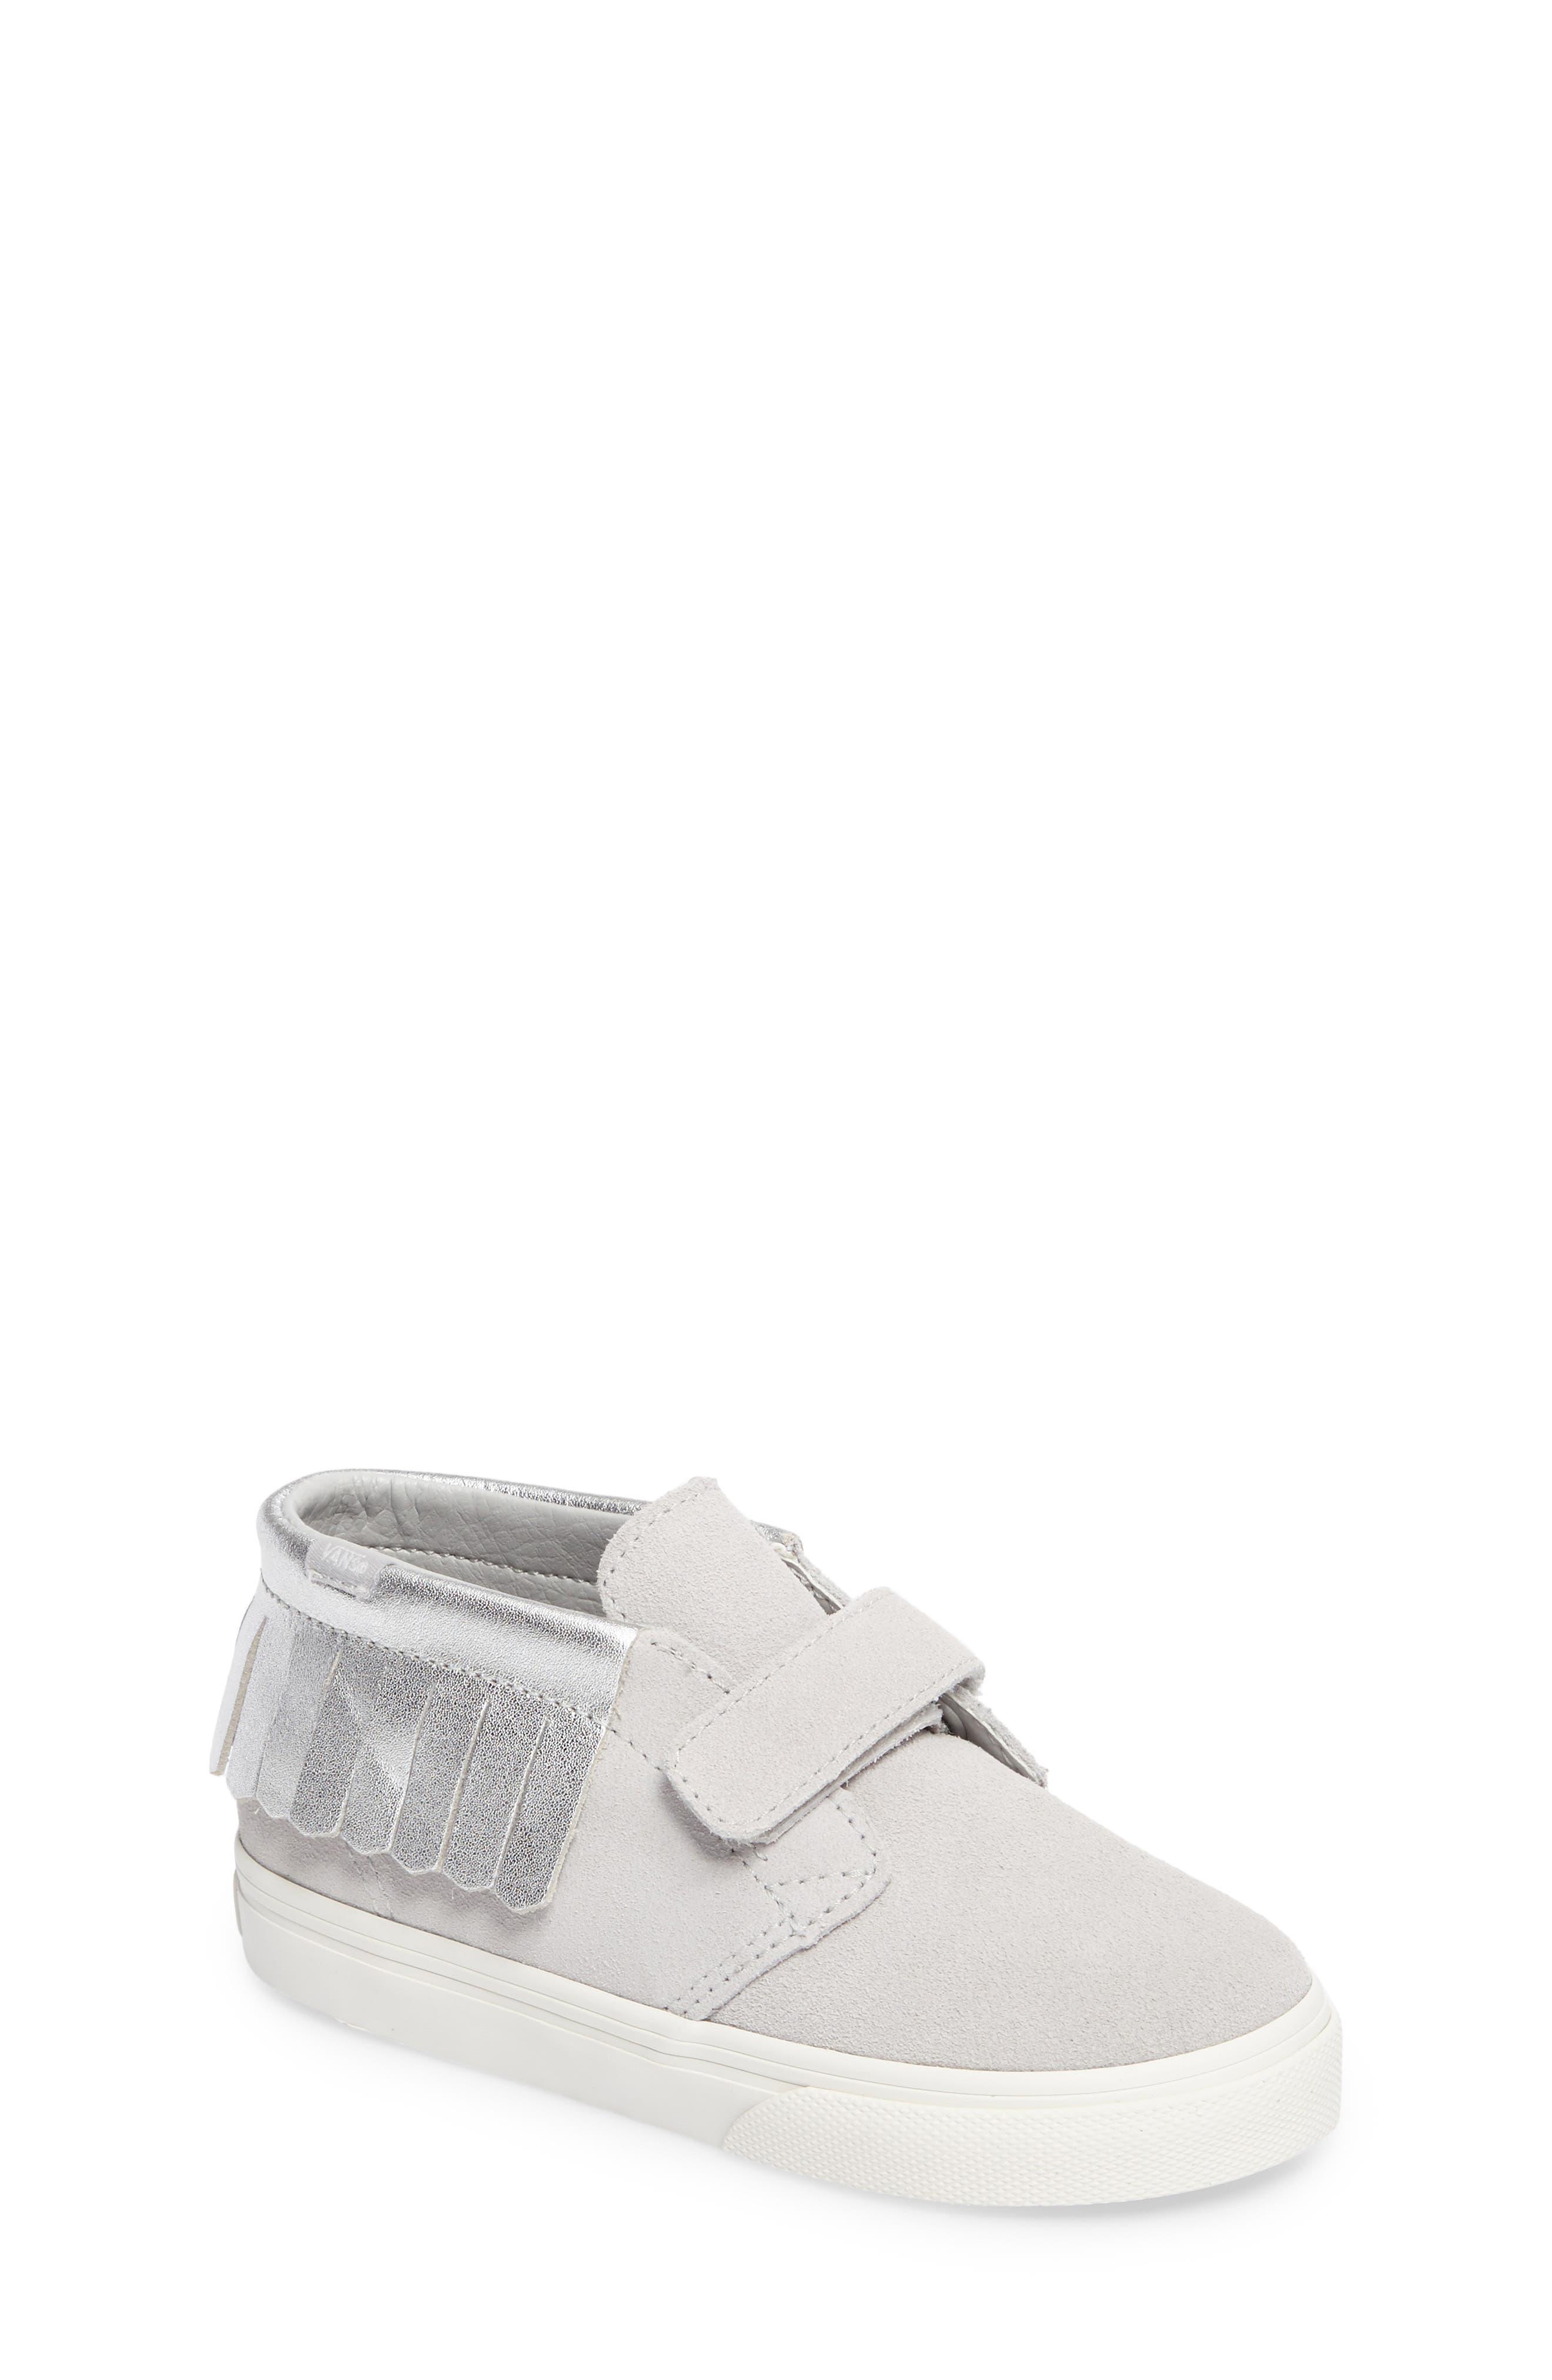 Chukka V Moc Sneaker,                         Main,                         color, 040